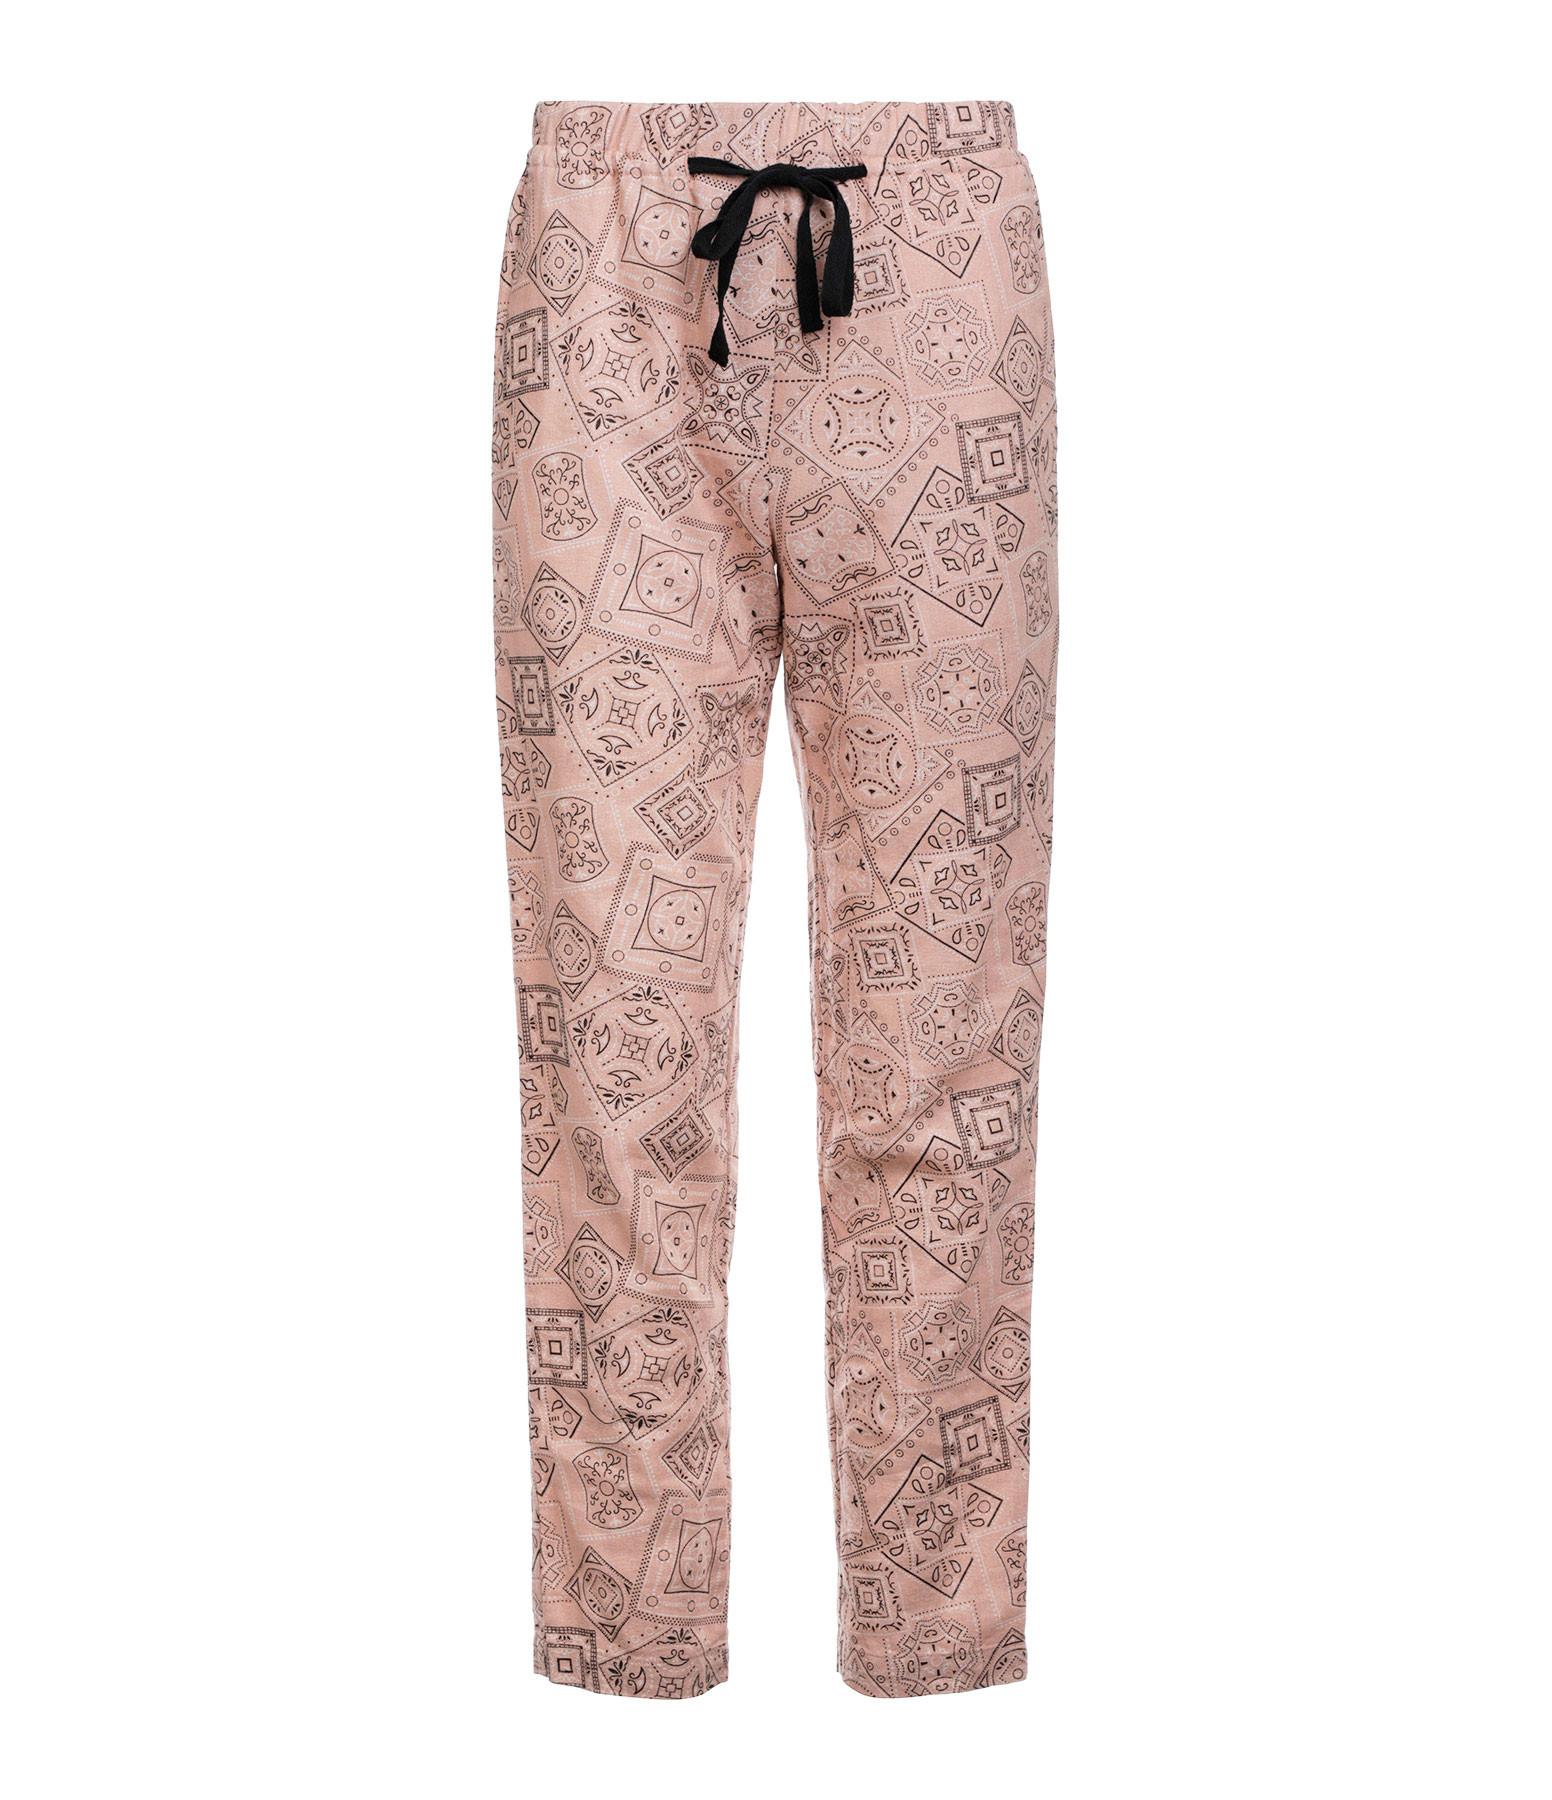 OVERLOVER - Pantalon Yucca Lin Coton Bandana Powder Imprimé